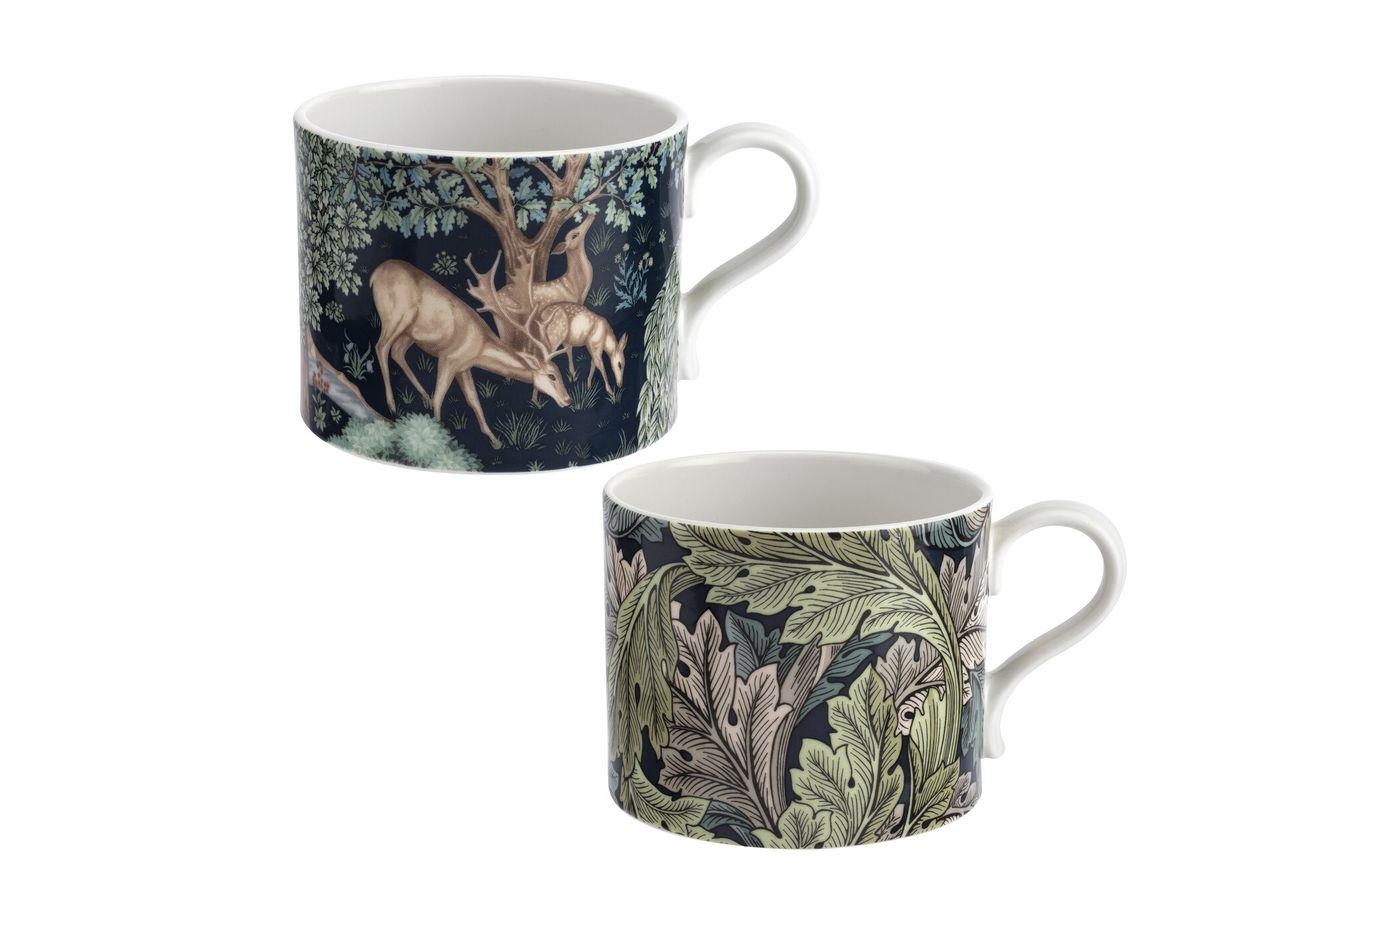 Spode The Original Morris & Co. Mug - Set of 2 Brook & Acanthus 0.34l thumb 1